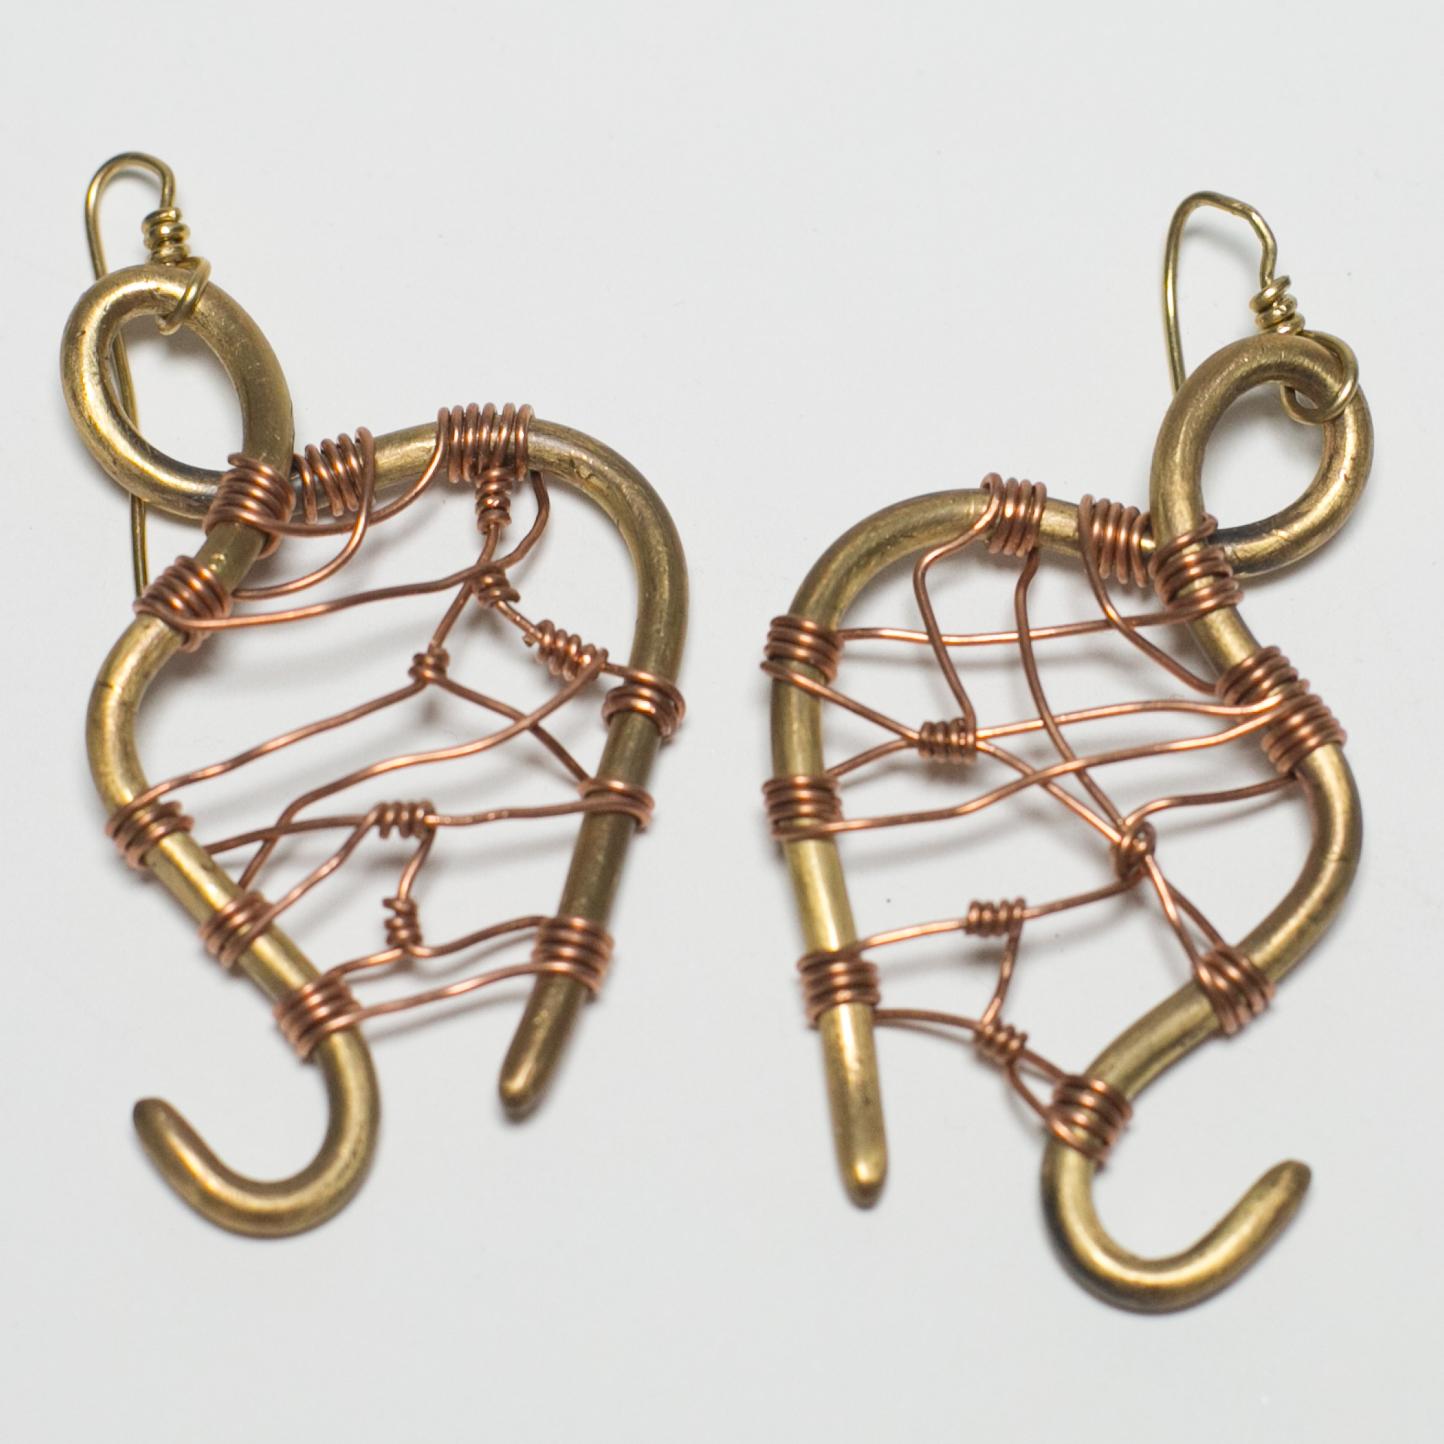 Kemet Harp Earrings